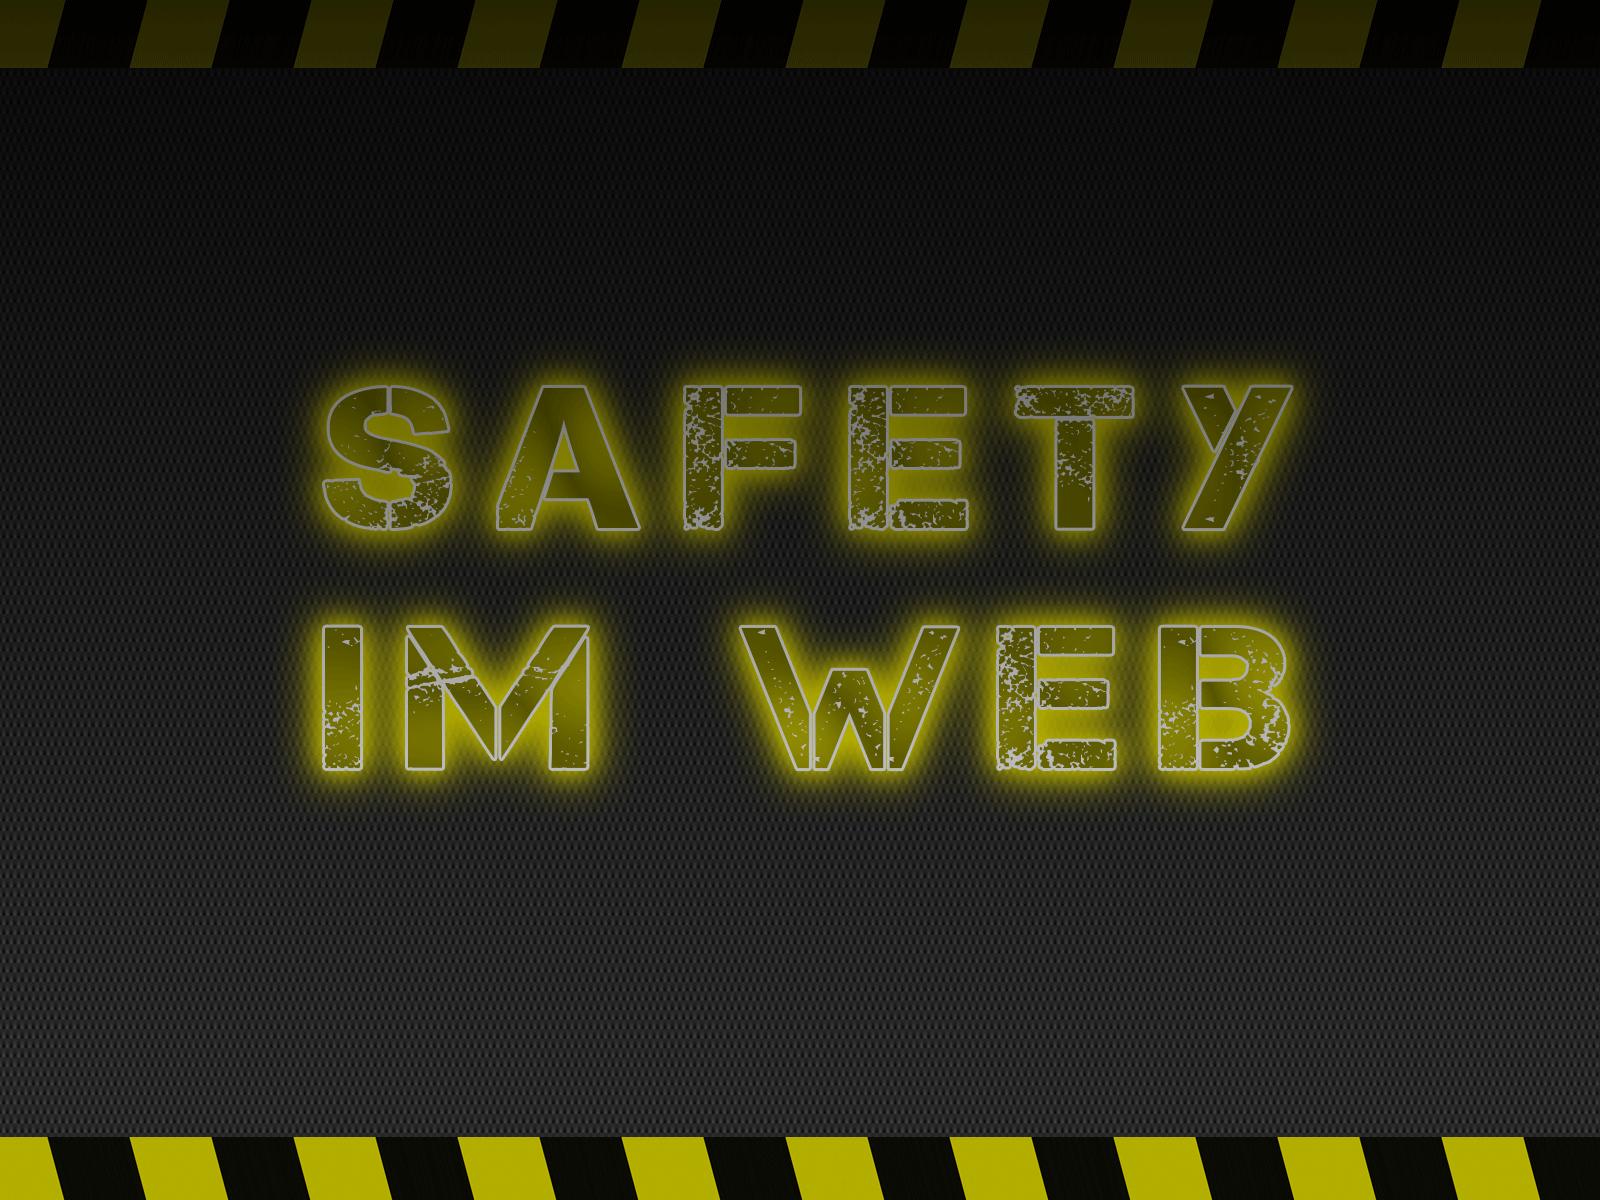 Sicherheitsfachkraft // Arbeitssicherheit // social media // Michael Mike Meier // Blog // Präventivkraft // Arbeitsschutz // SFK